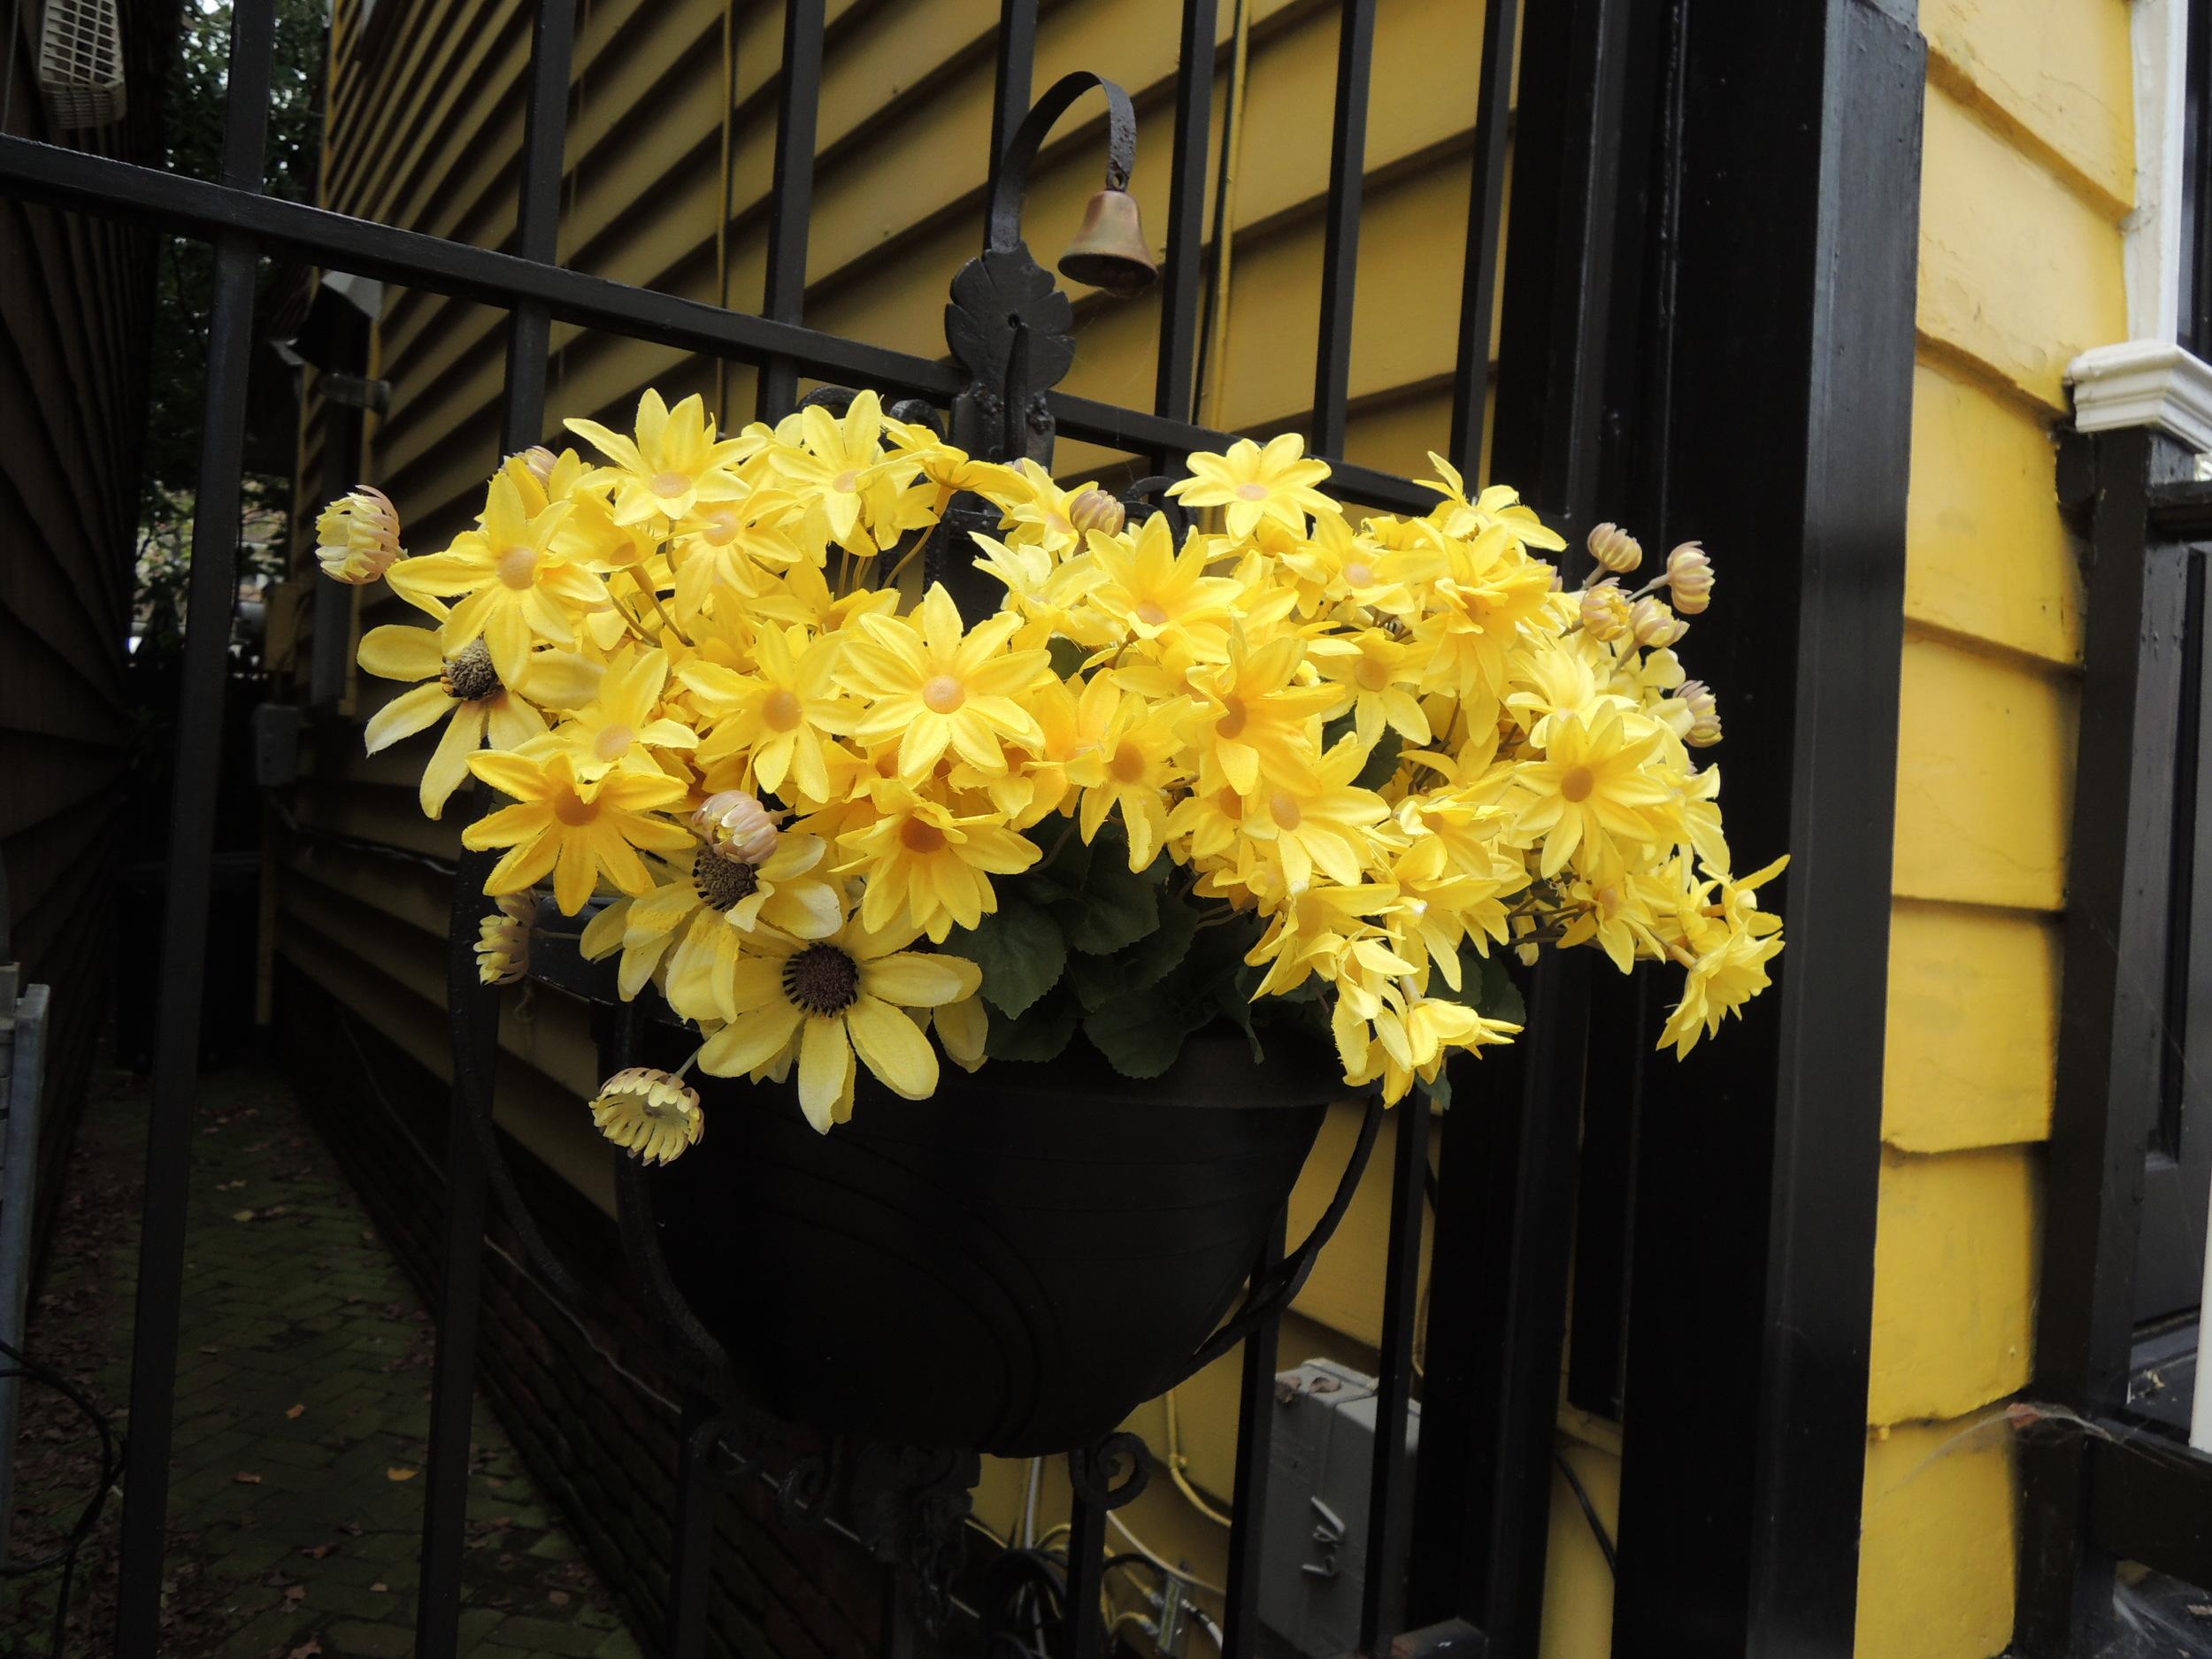 An adorable flower box